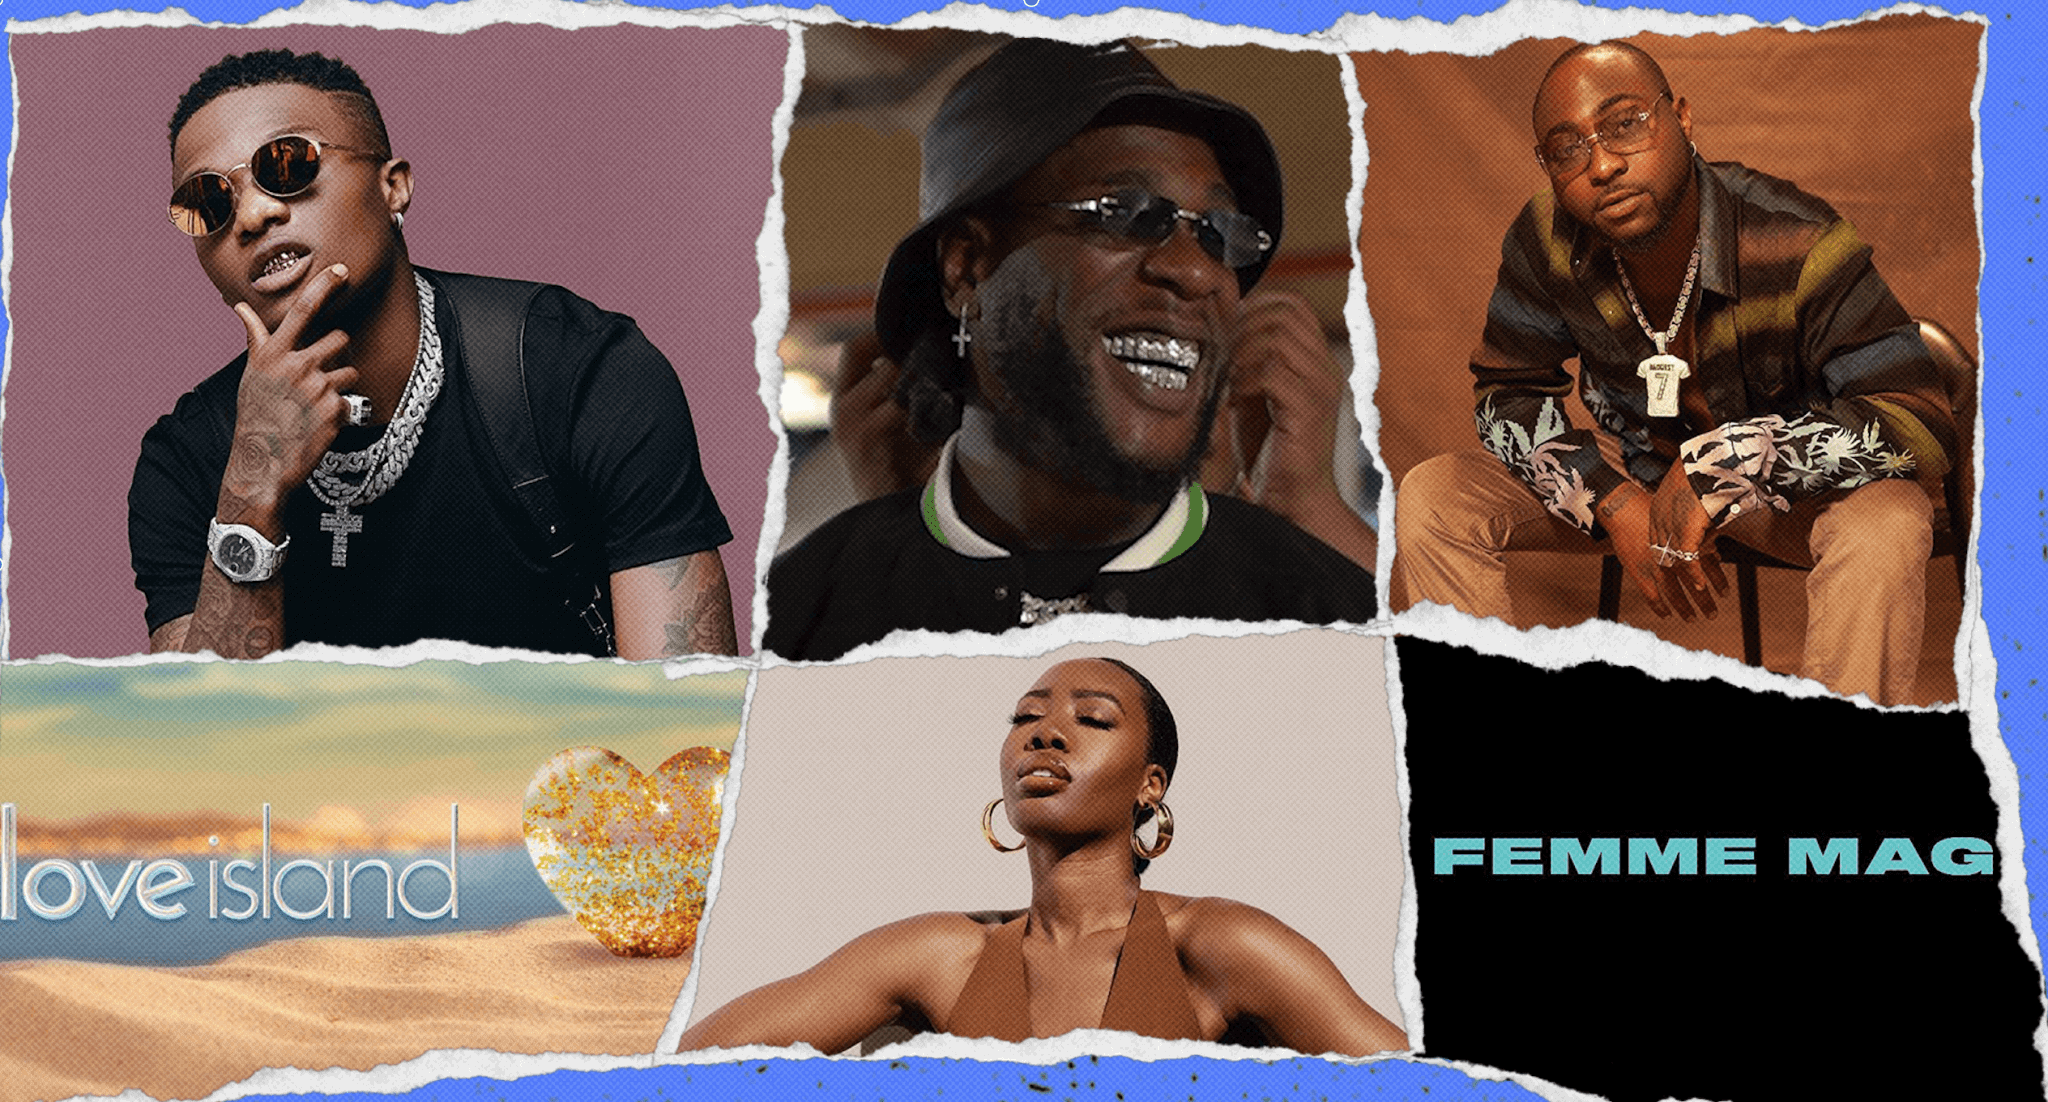 Hot Takes: Love Island NG, Wizkid, Davido & Burna, FemmeMag & more